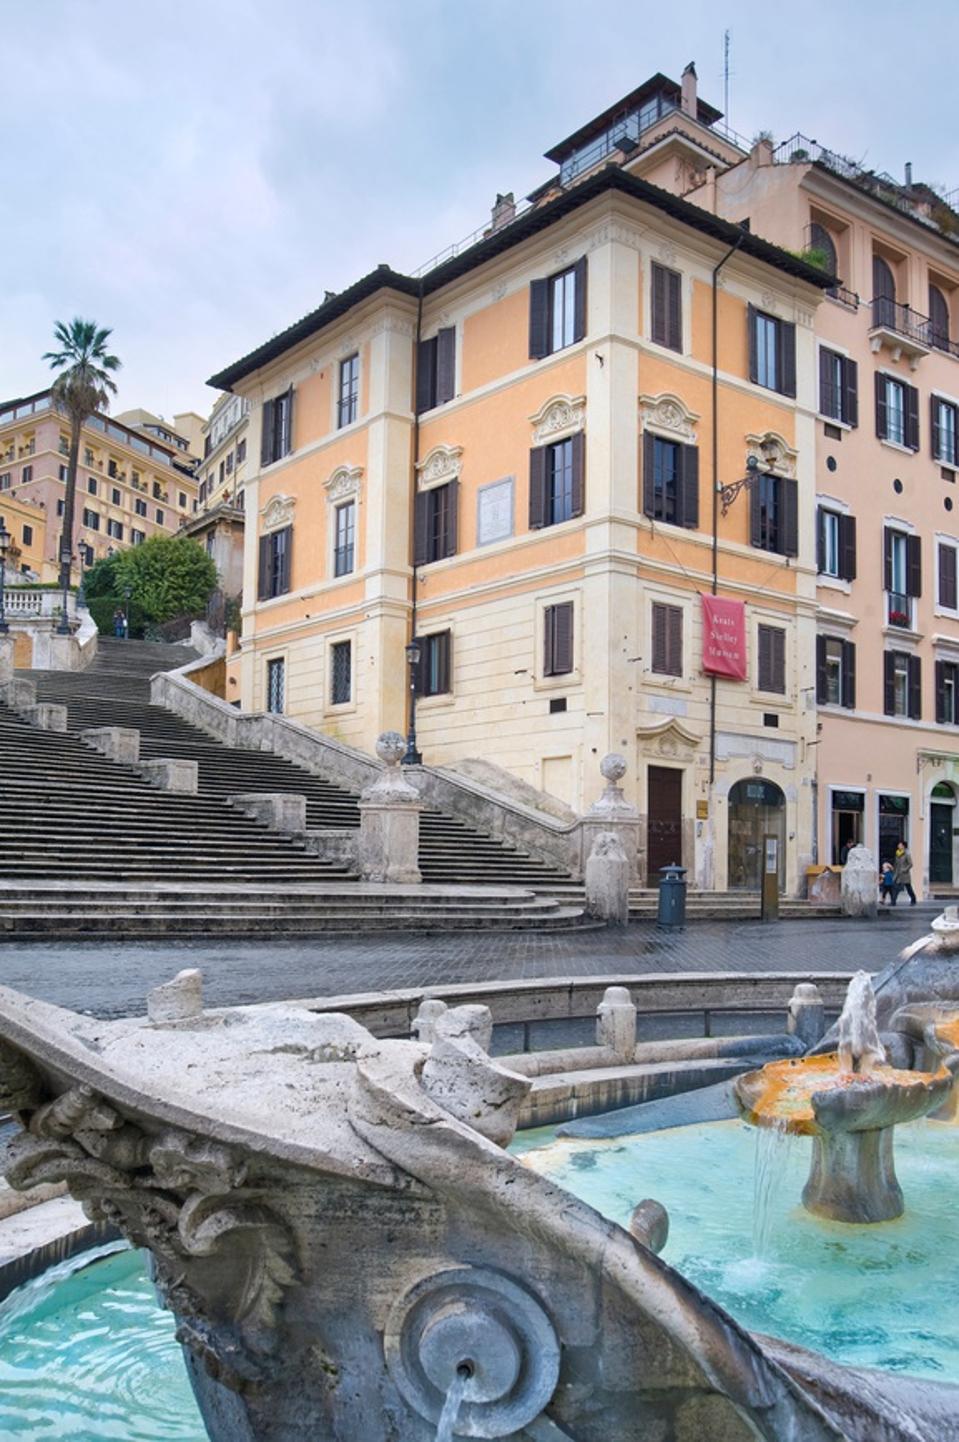 Piazza Di Spagna. Keats-shelley Memorial House. Rome. Italy